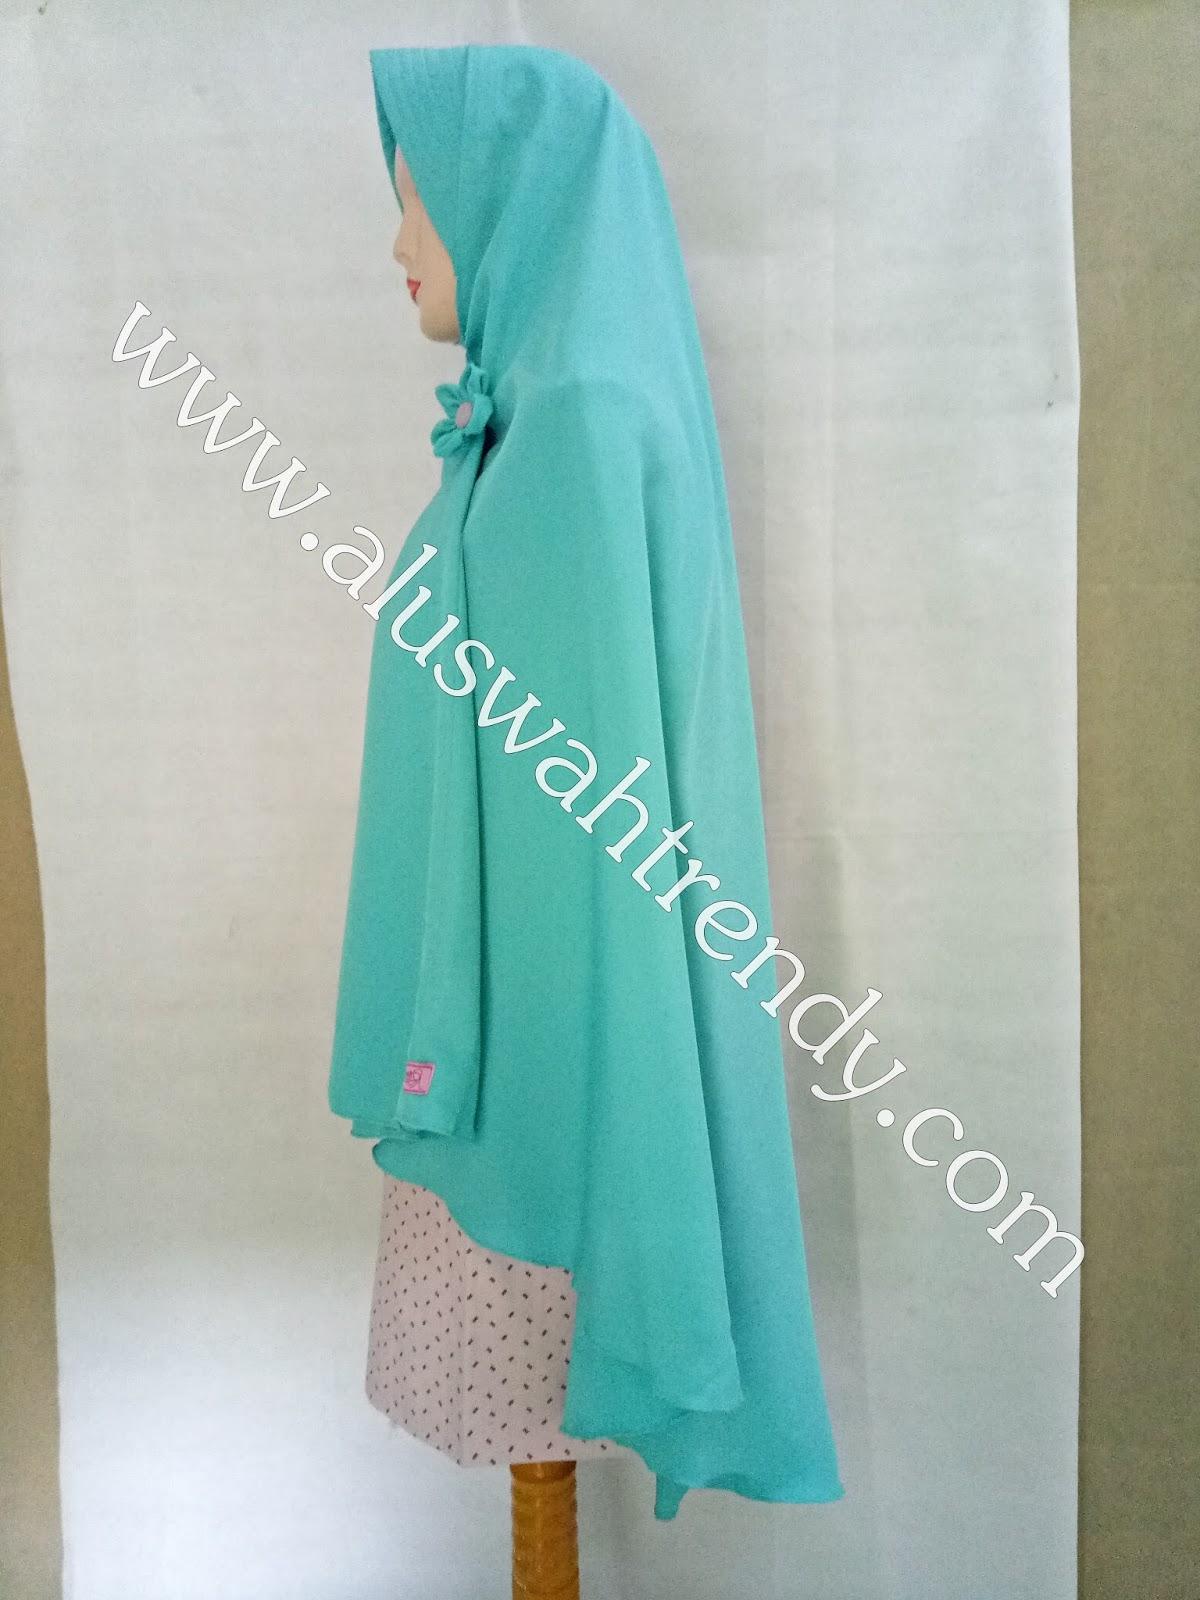 Baju Hijau Cocok Dengan Jilbab Warna Apa Model Baju Trend 2019